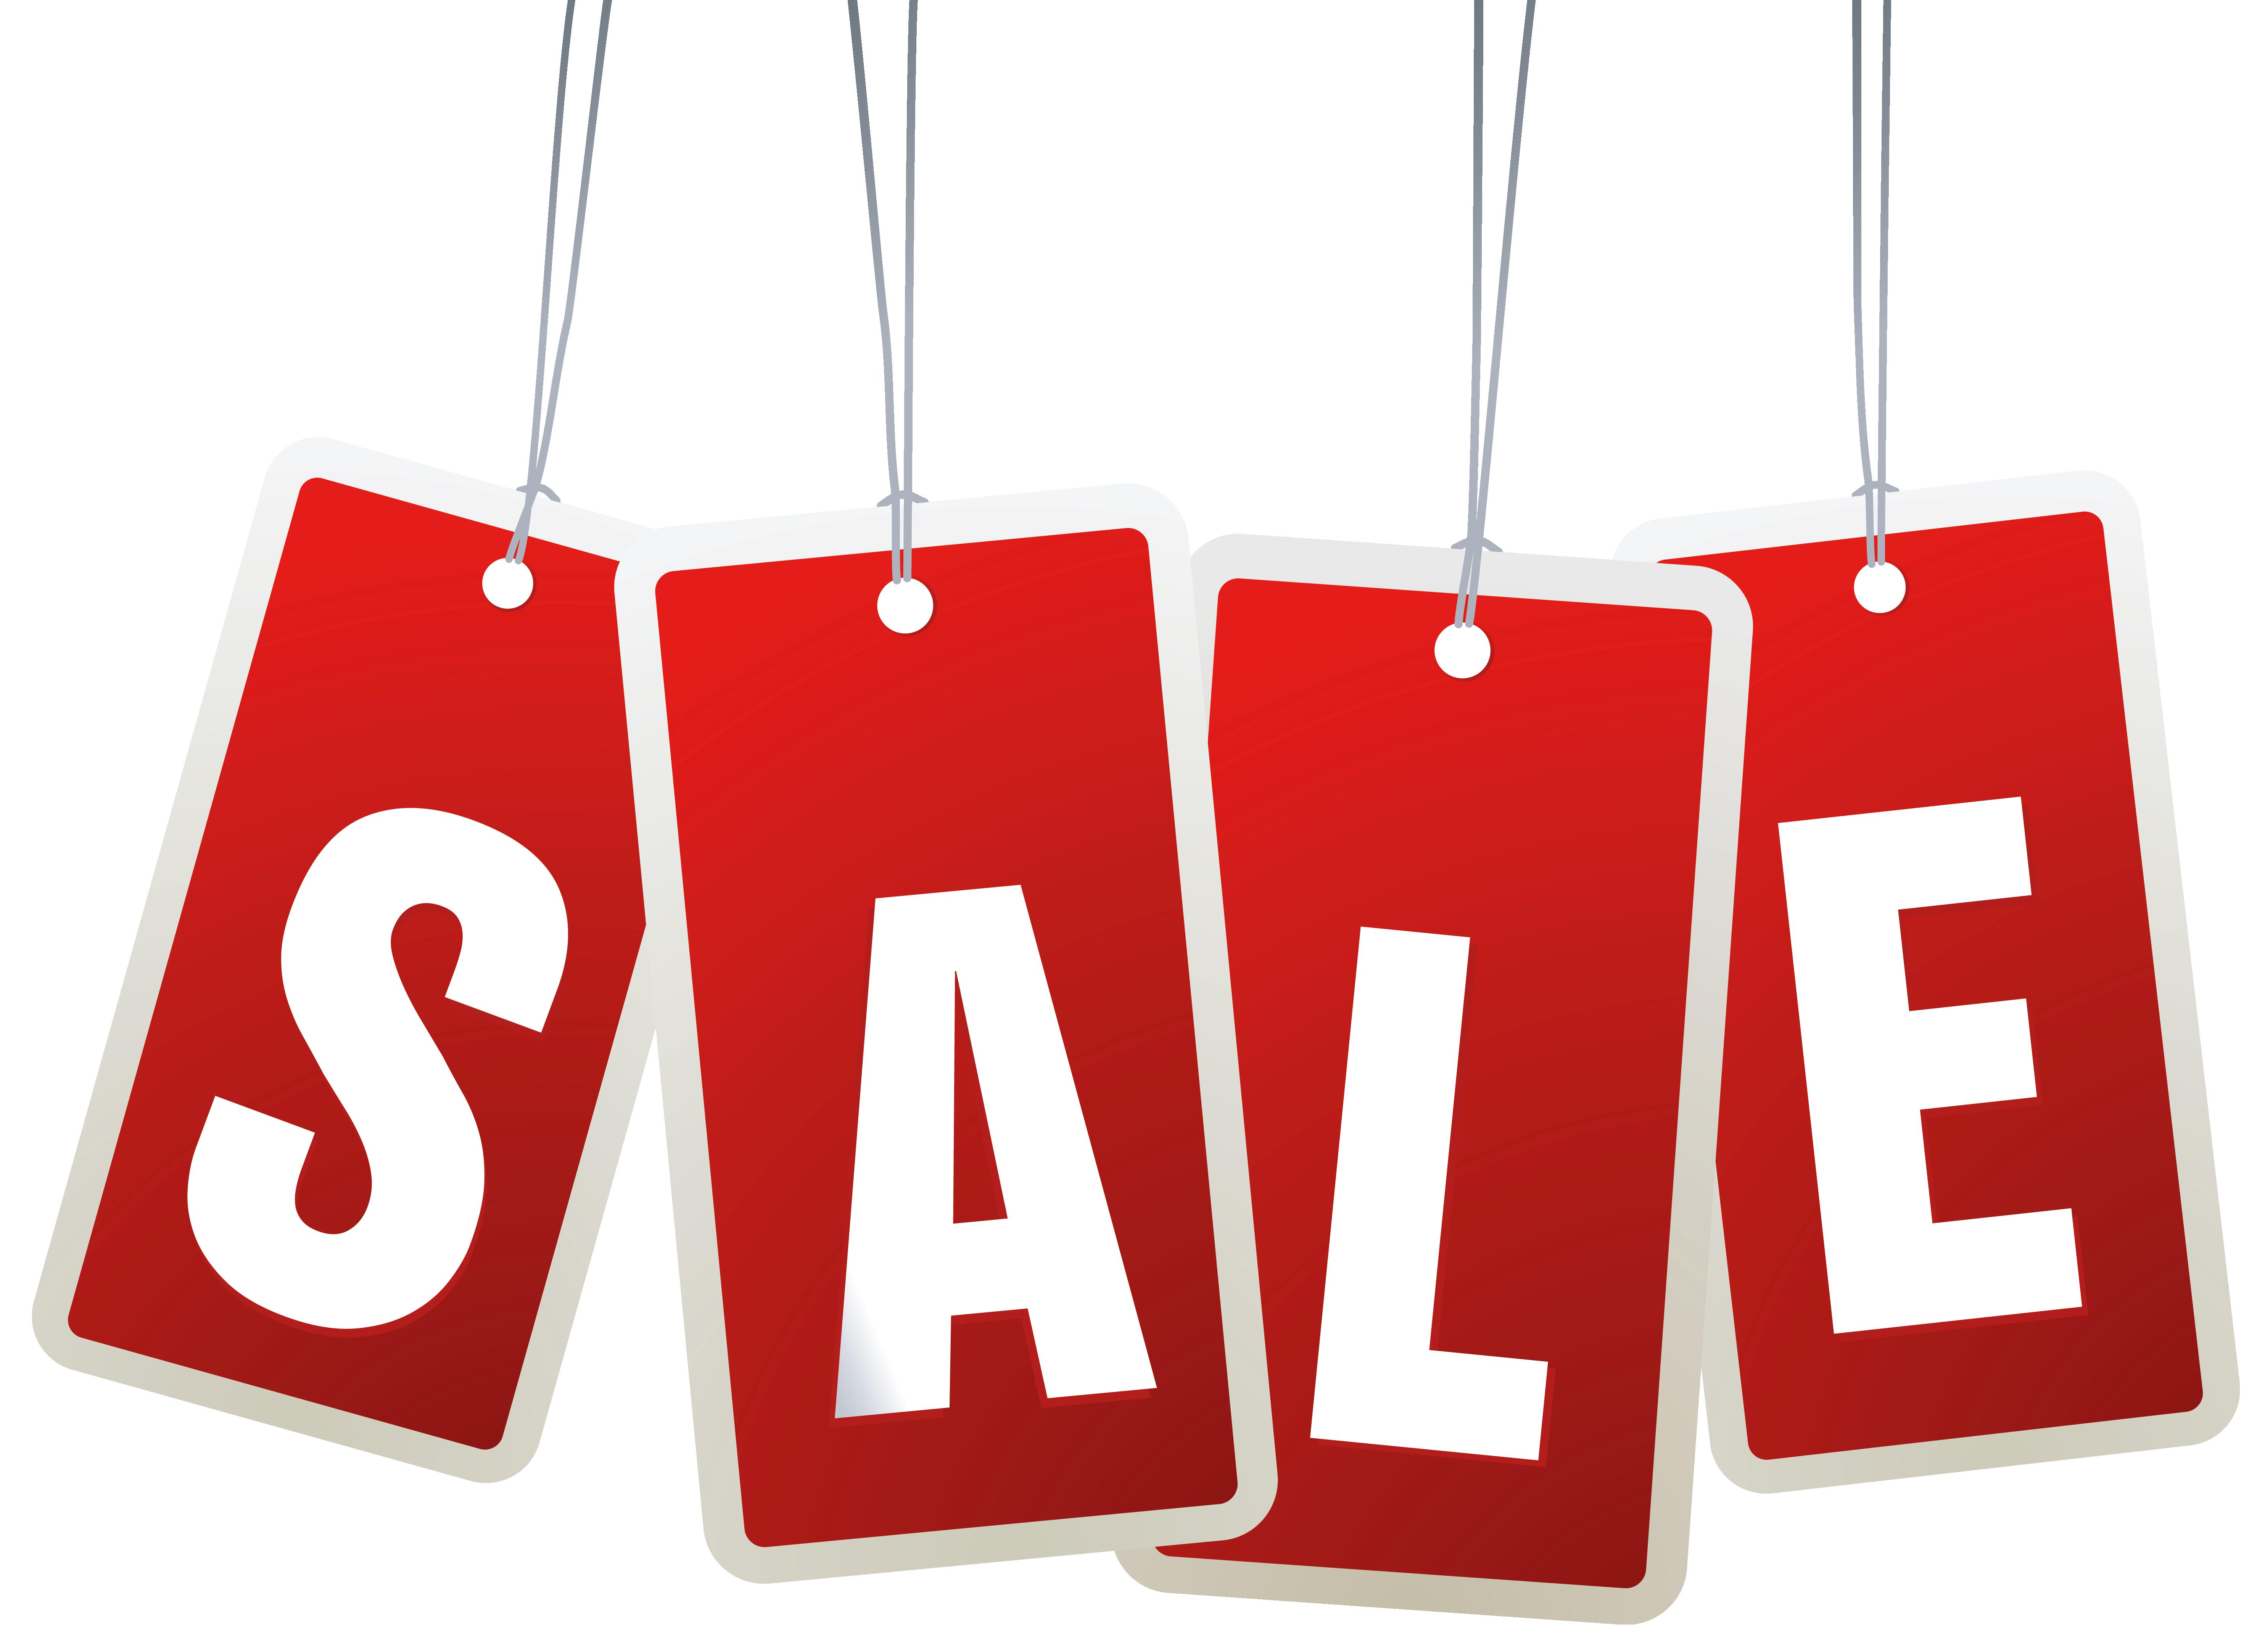 5937x4330 Sale Clip Art